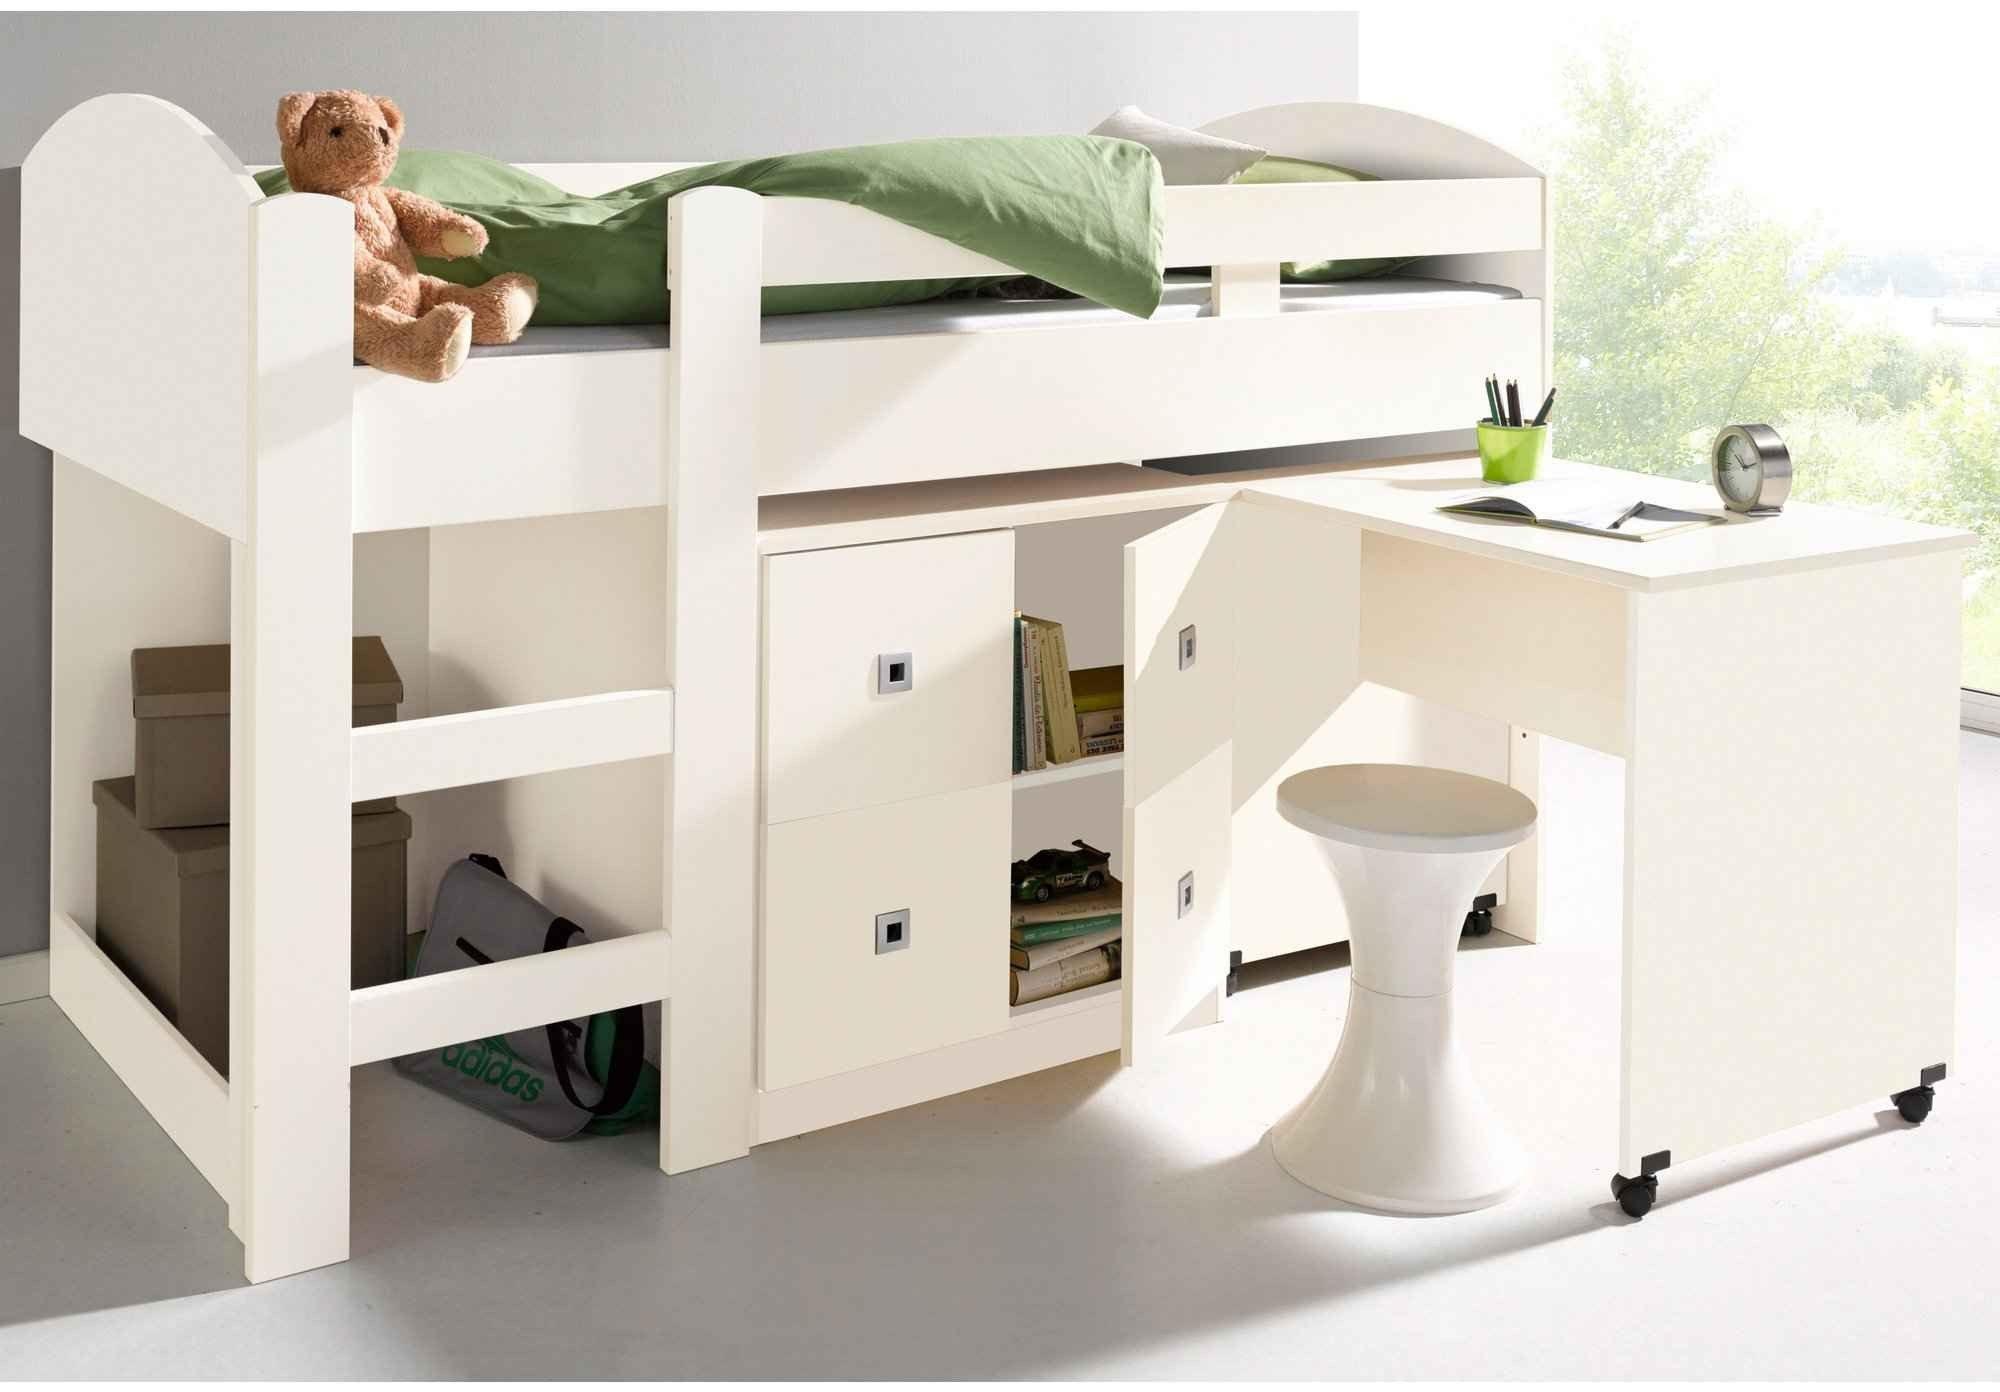 Lit Mezzanine 90×190 Joli Bureau Ado Avec Rangement Lit Bureau Enfant Bine 90—190 Cm